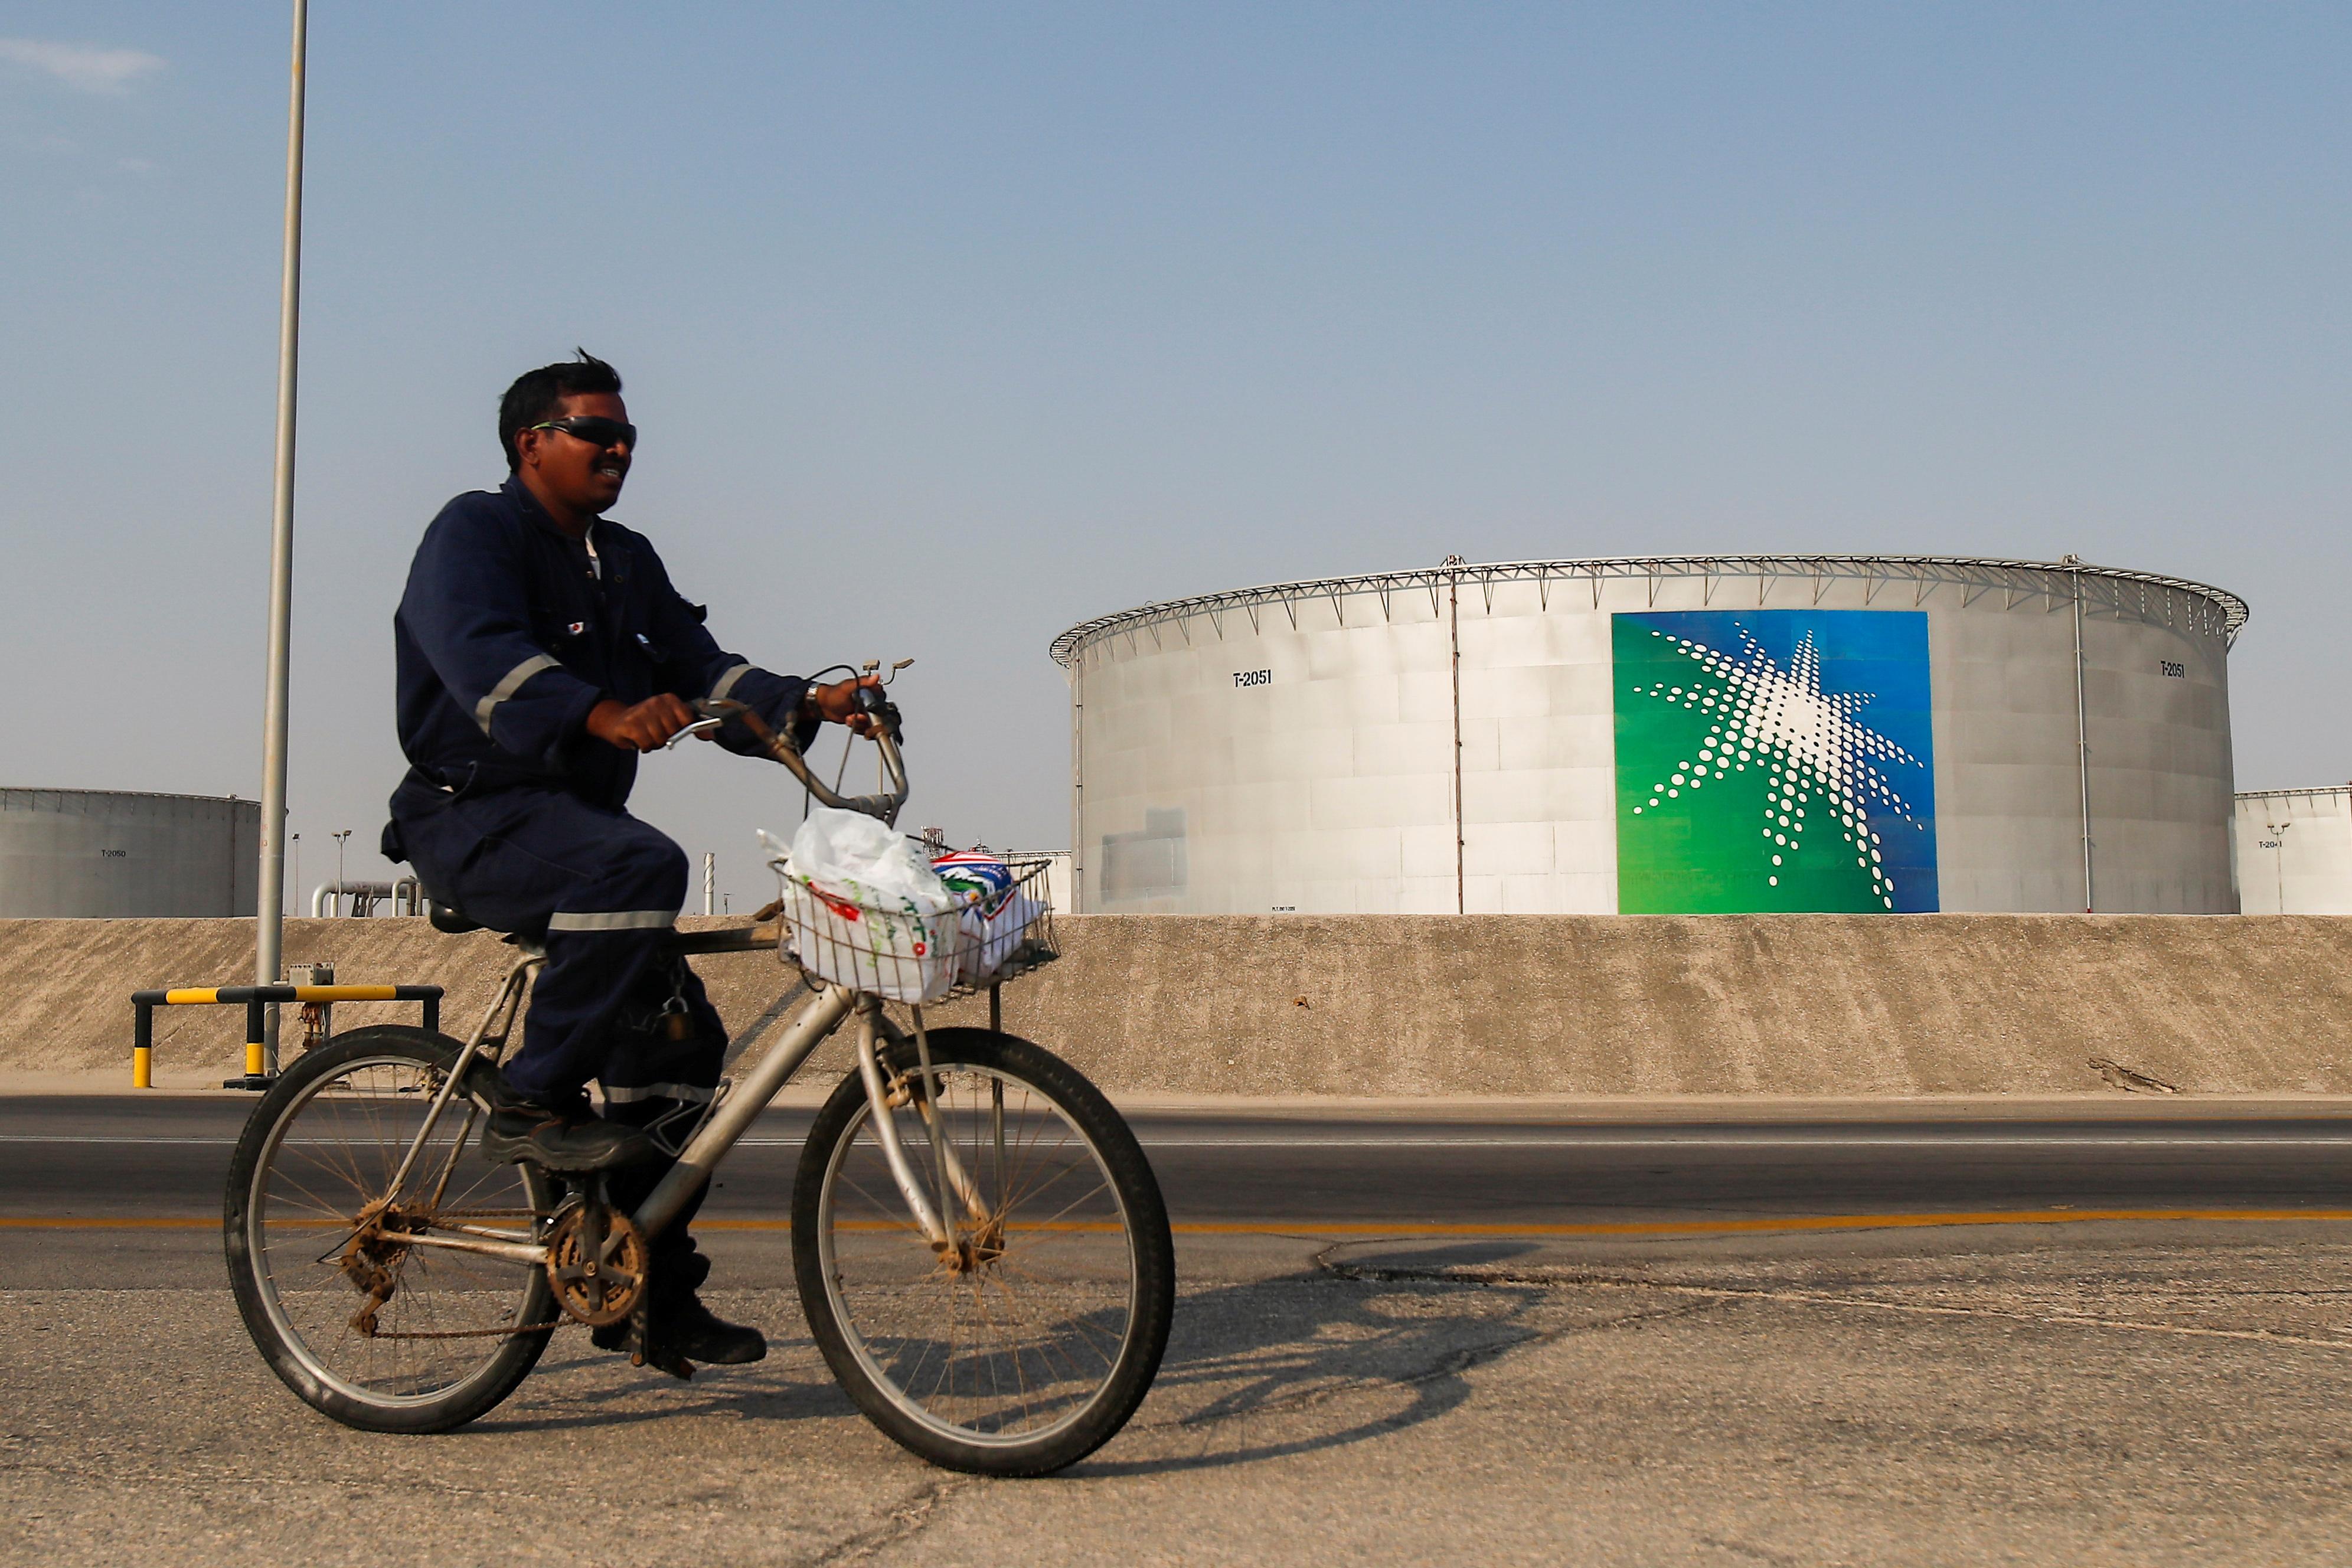 Saudi Aramco IPO announcement due 'very very soon' - chairman